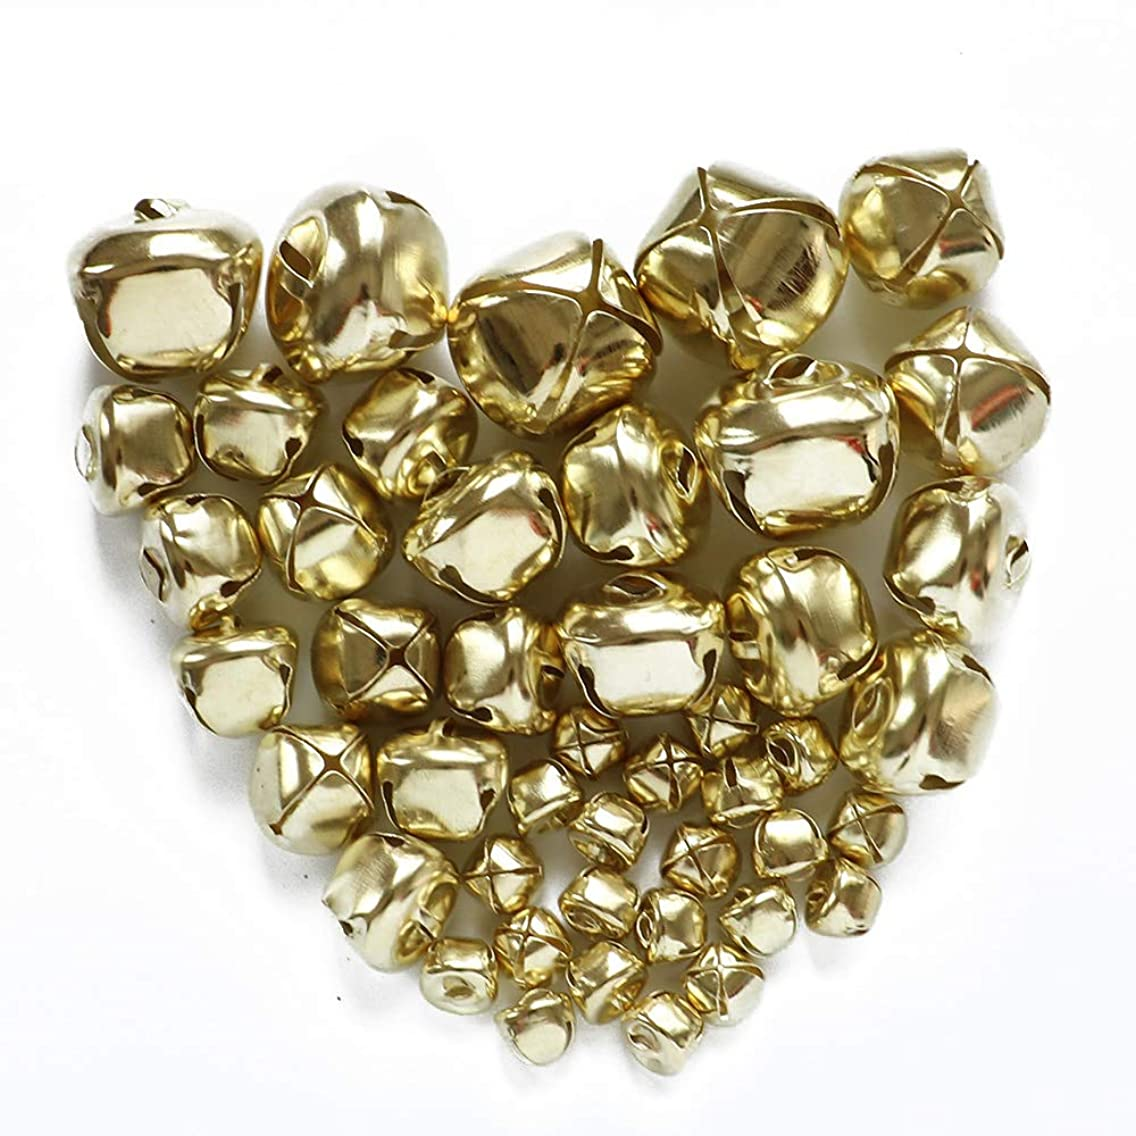 YEJI 200pcs Gold Multi-sized Christmas Bells Iron Loose metal Beads Jingle Bells Christmas Decoration Pendants DIY Crafts Handmade Accessories